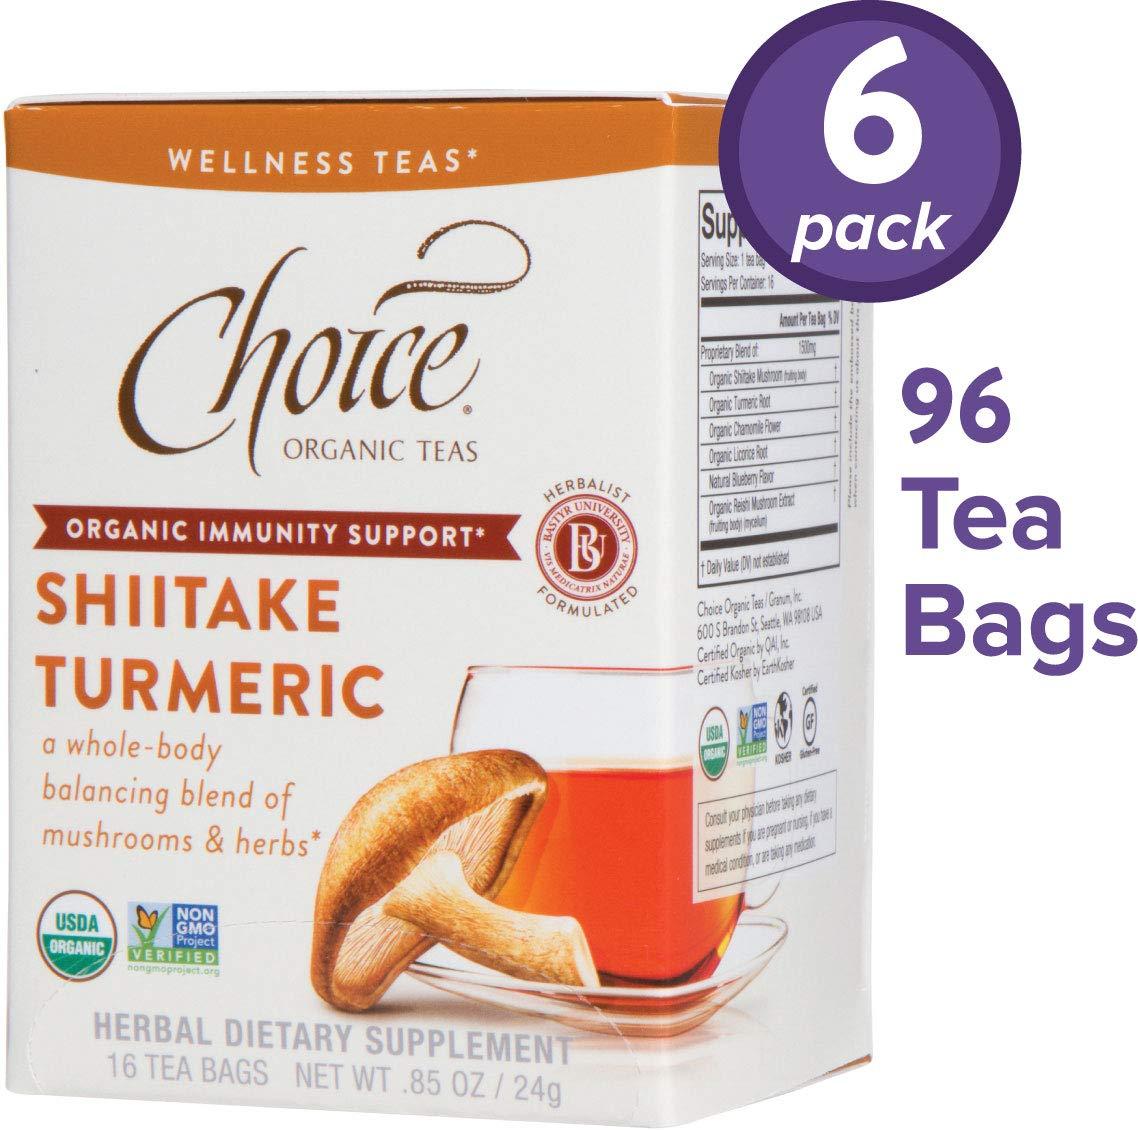 Choice Organic Teas Wellness Teas, 6 Boxes of 16 (96 Tea Bags), Shiitake Turmeric, Caffeine Free